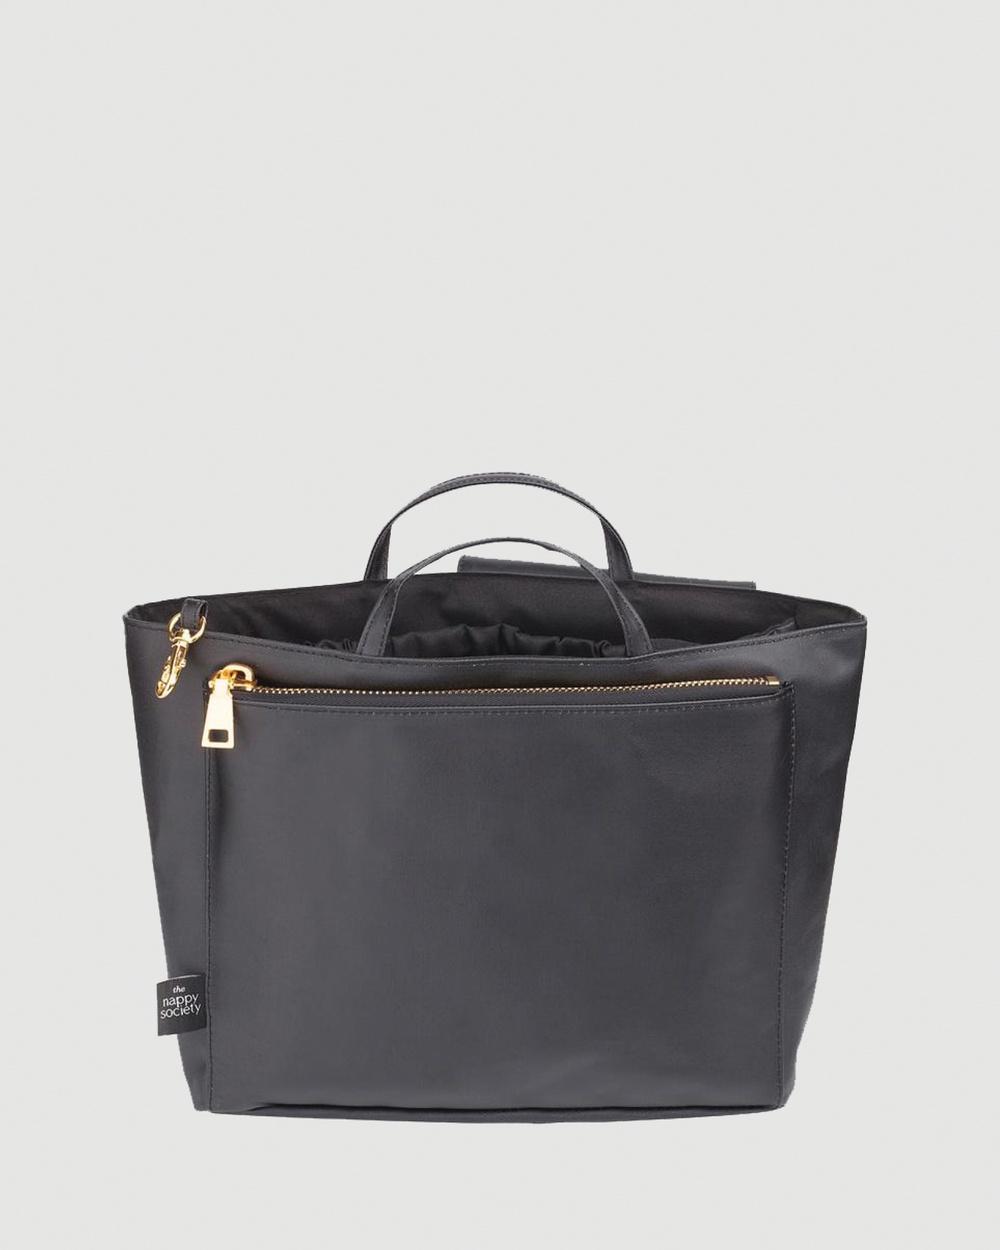 The Nappy Society Compact Bag Insert Bags Black Australia